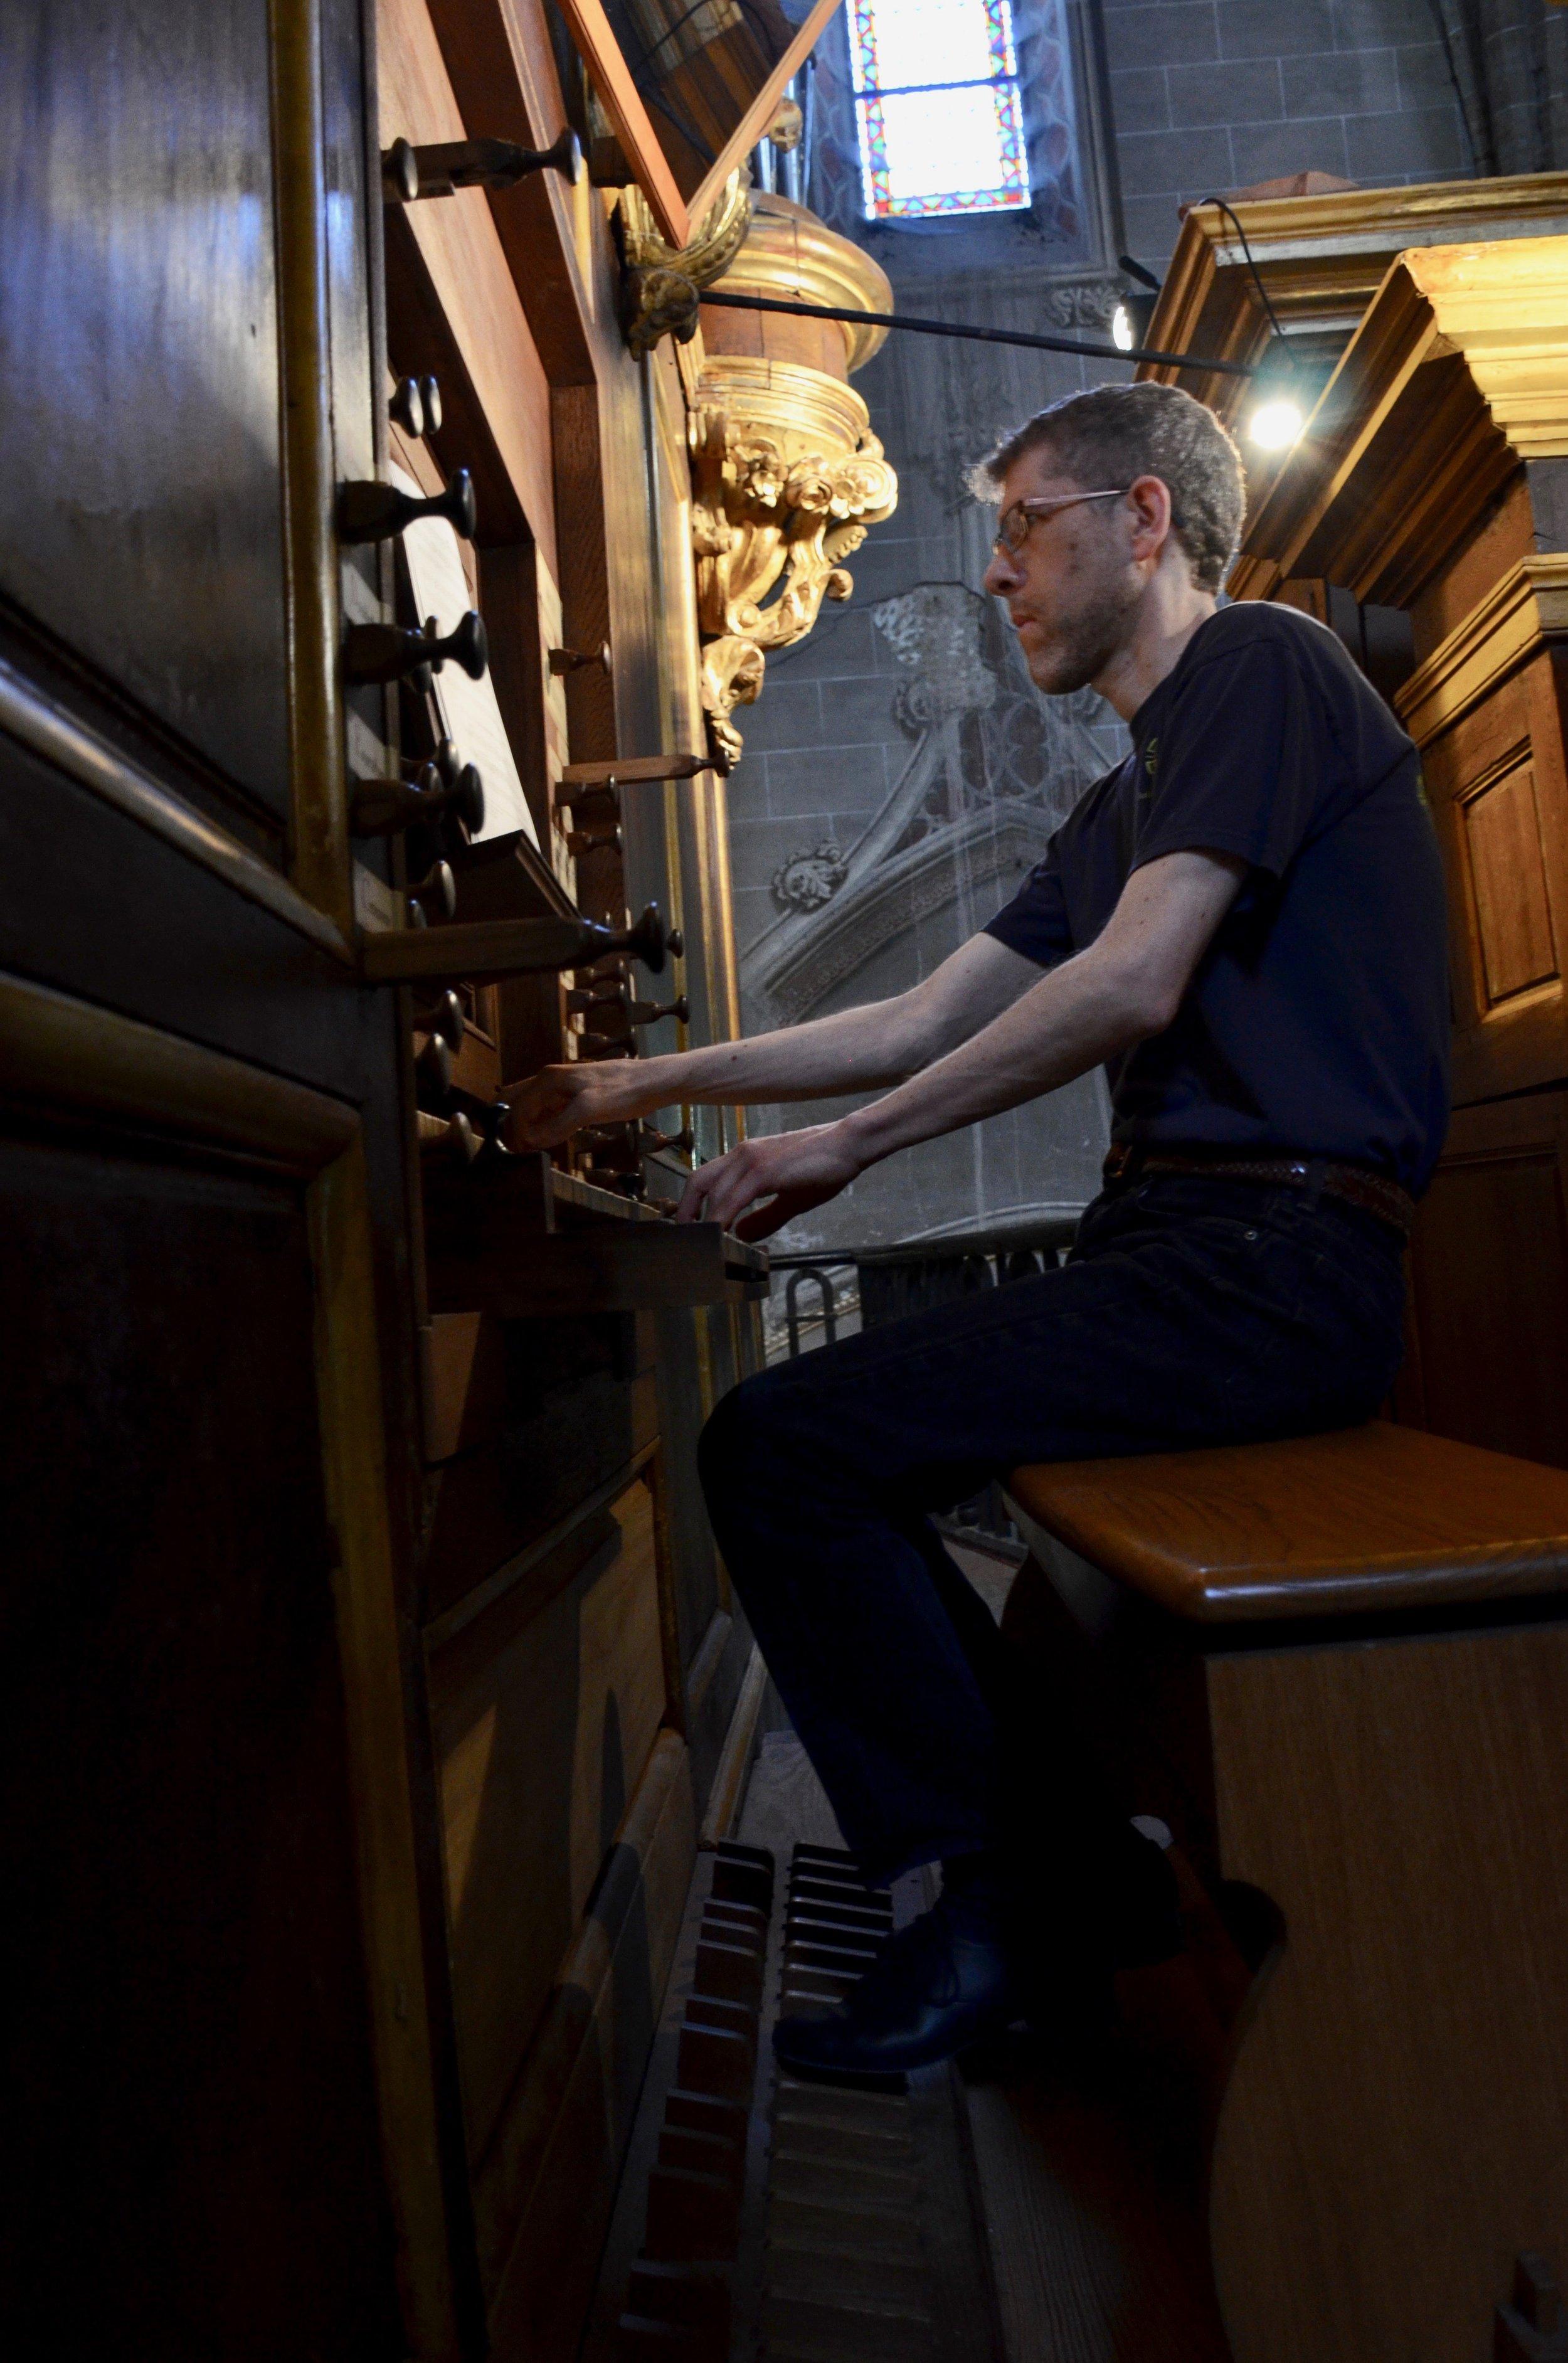 Chris Porter plays the historic organ in Cintegabelle, France.